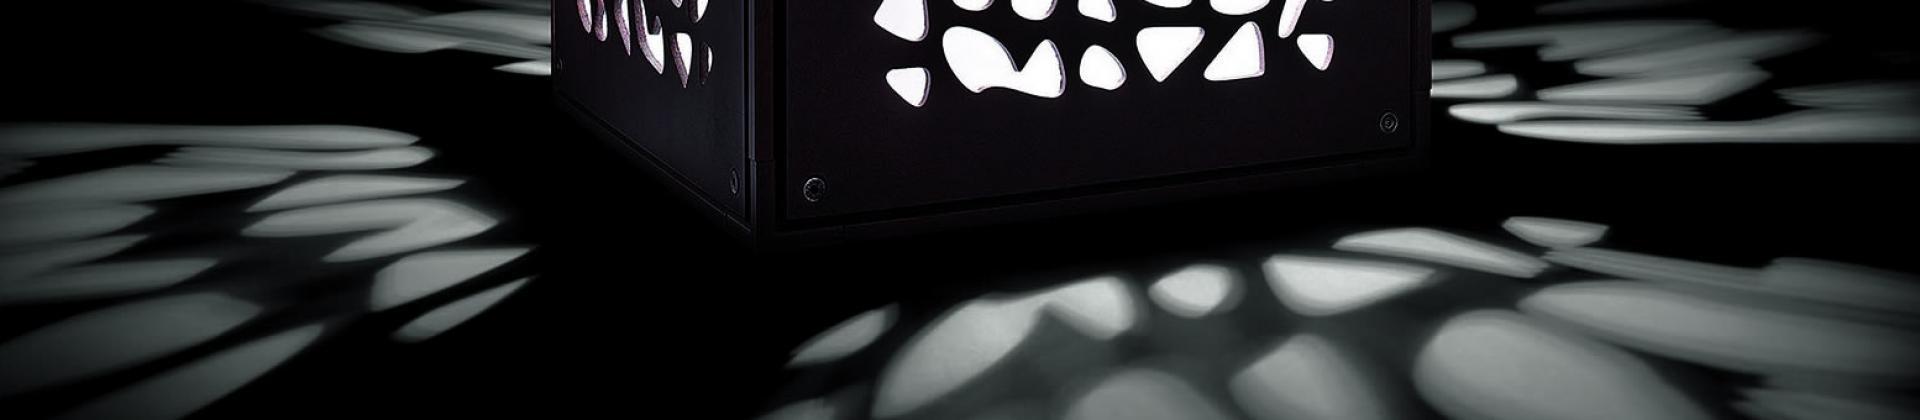 209 Prisma Architectural - Lámparas de diseño